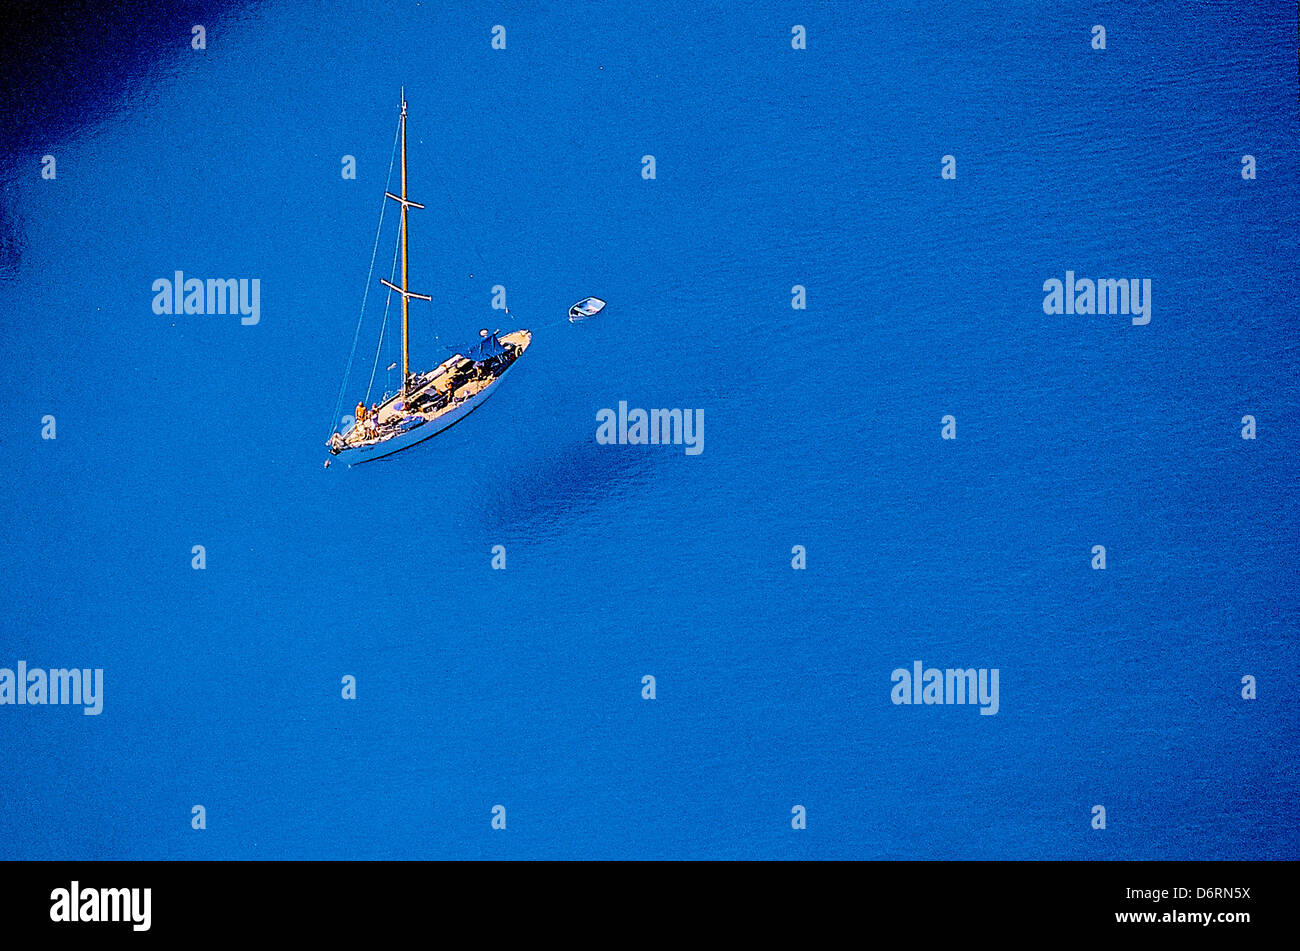 Greece, Ionian Sea, Zakynthos Island, Sailboat on blue sea - Stock Image